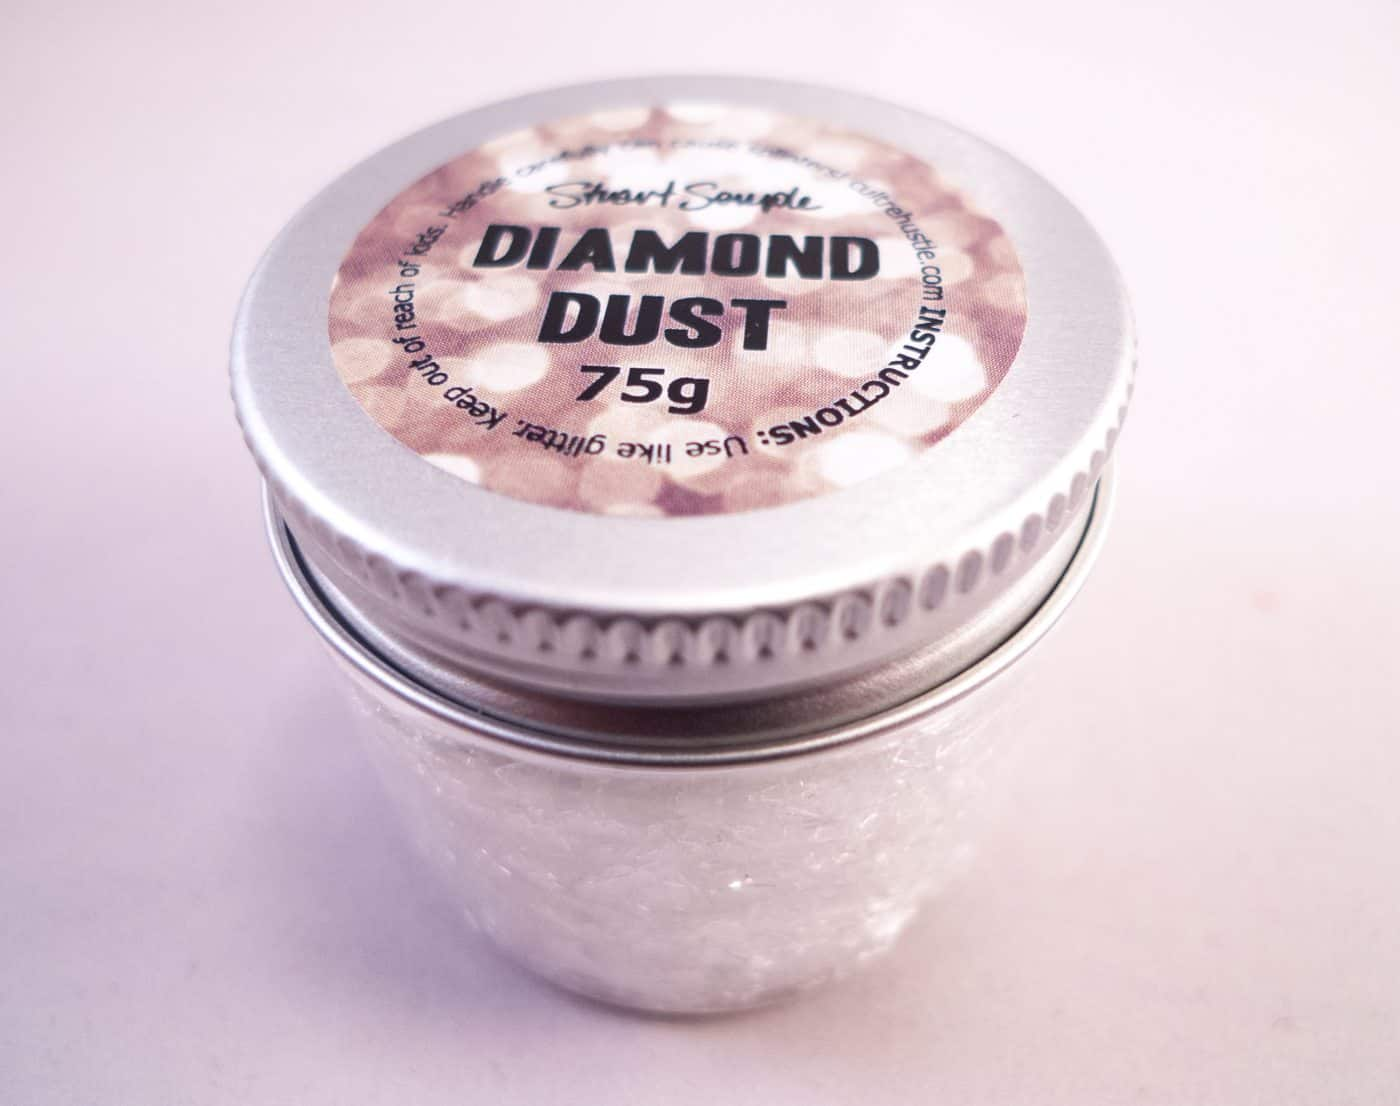 THE WORLD'S MOST GLITTERY GLITTER – 75g Diamond Dust by Stuart Semple